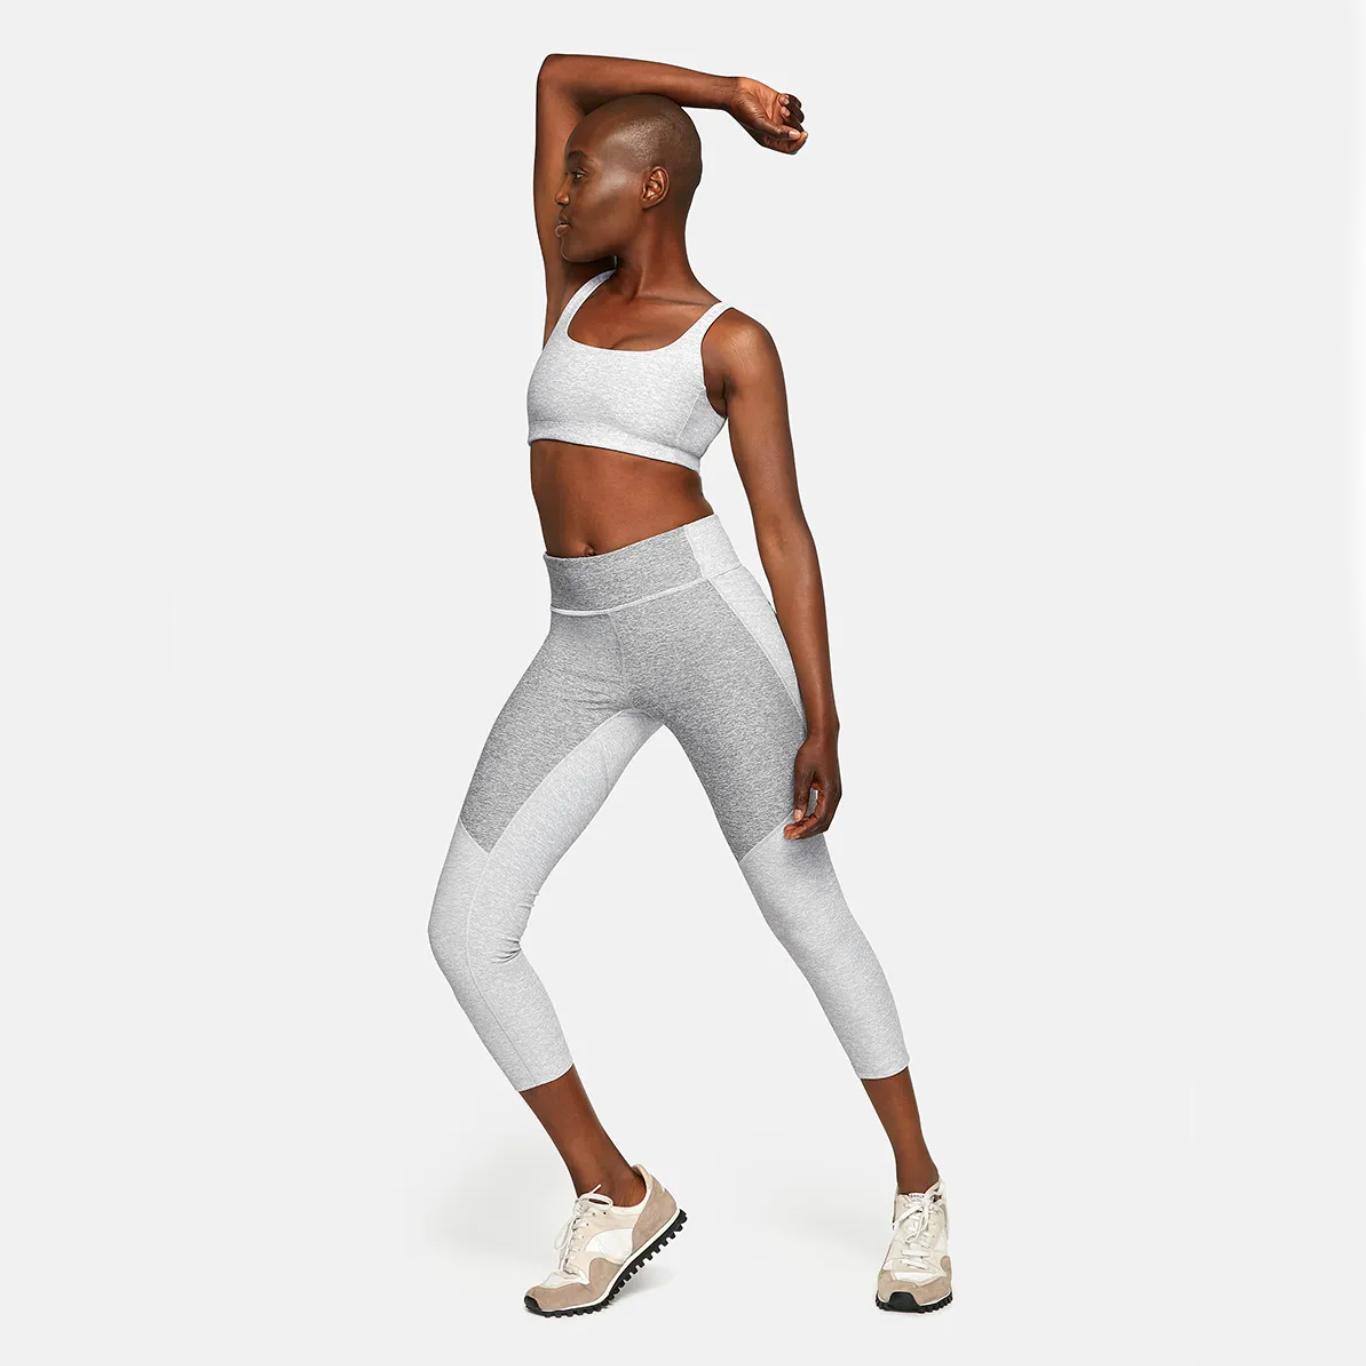 best workout sets zodiac sign